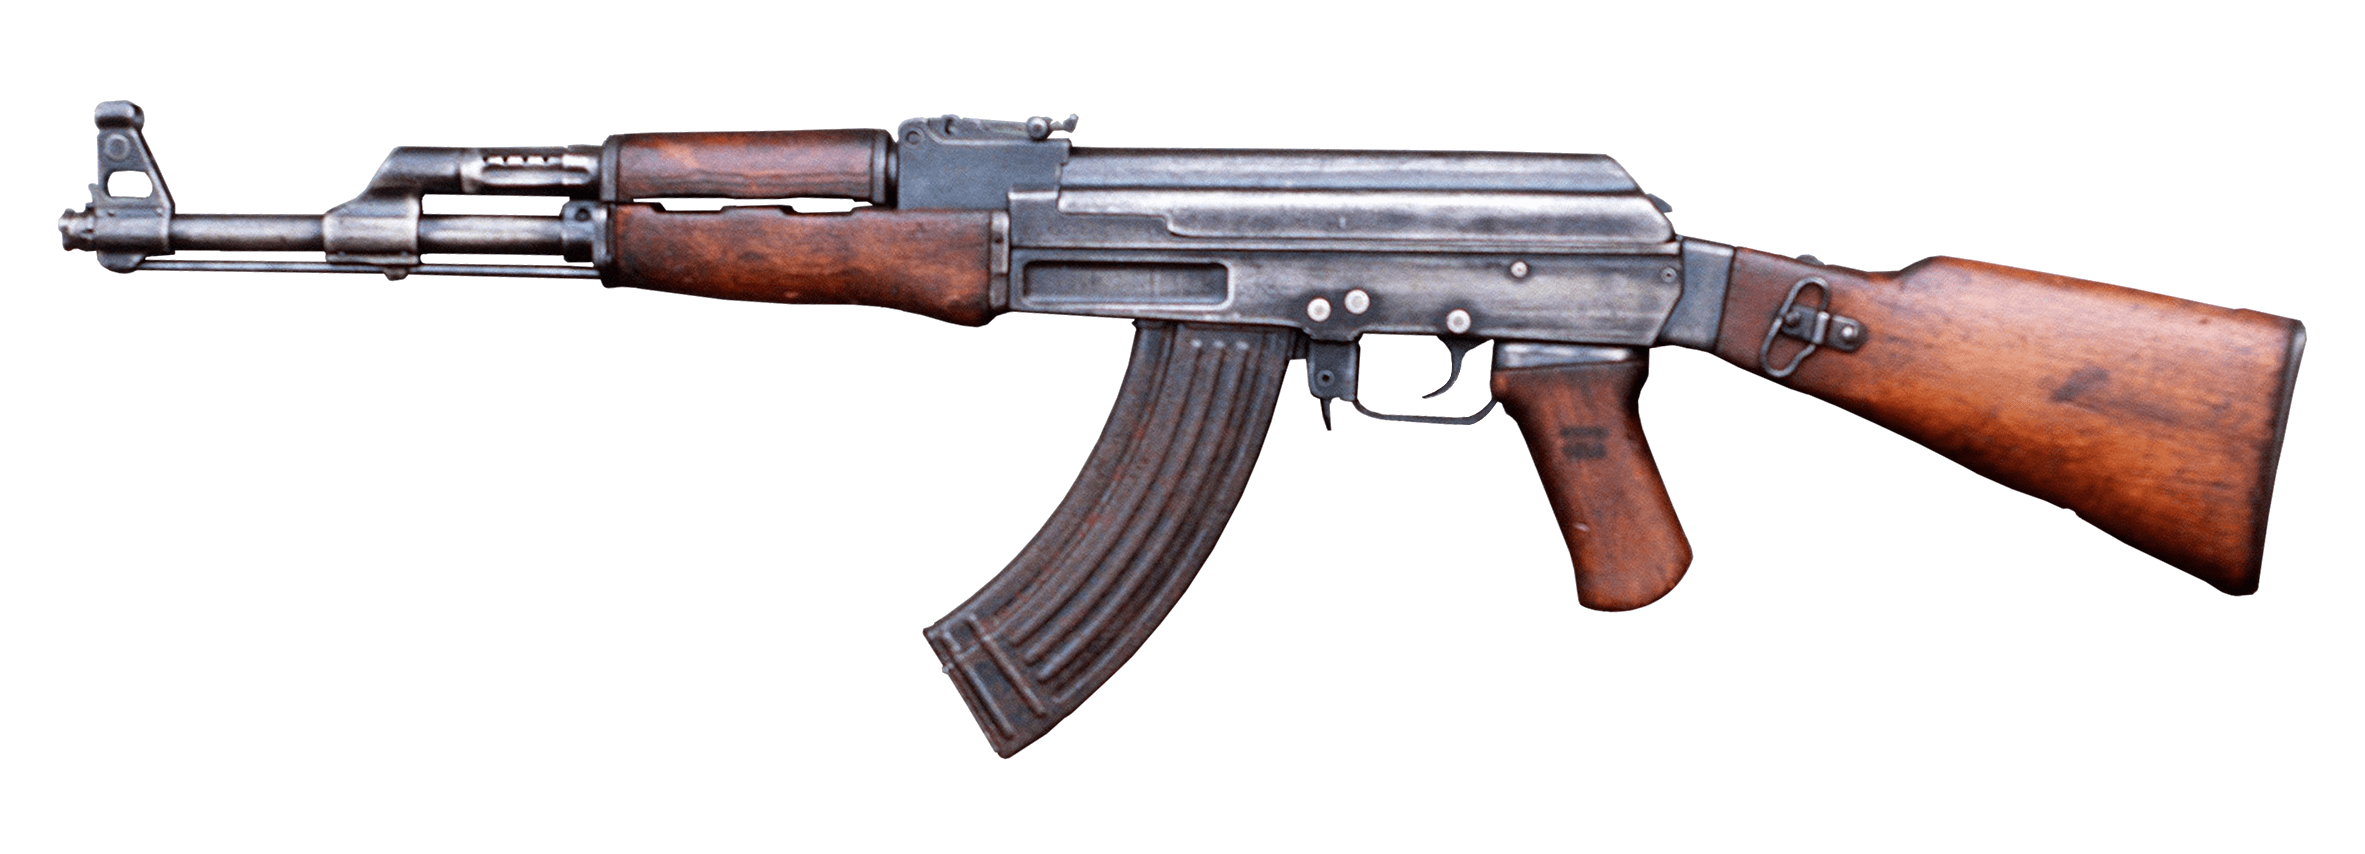 AK 47 transparent PNG.